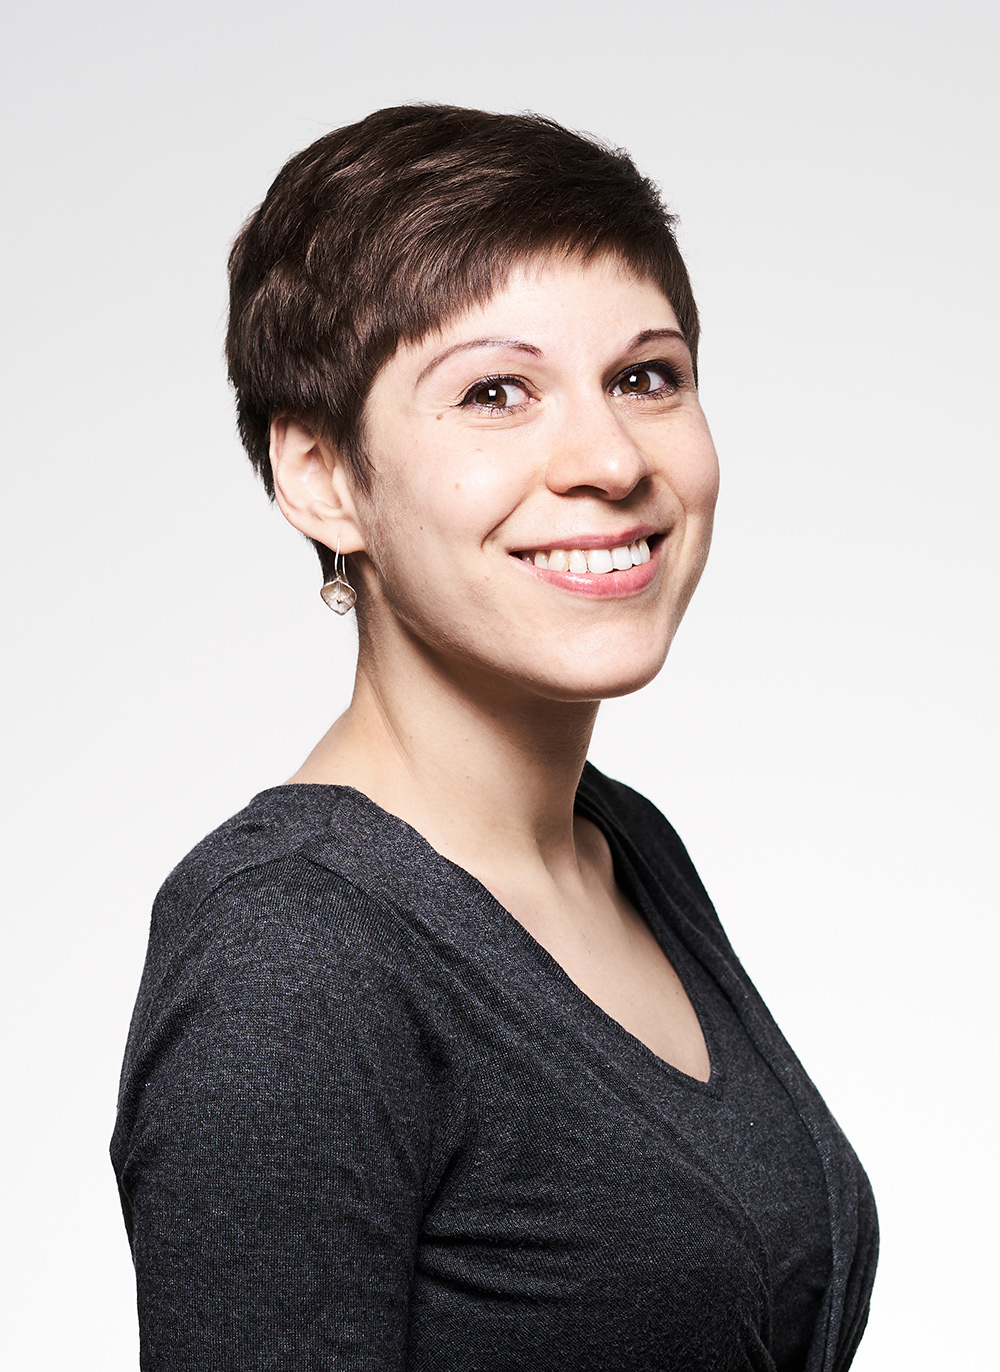 Sofia Buono